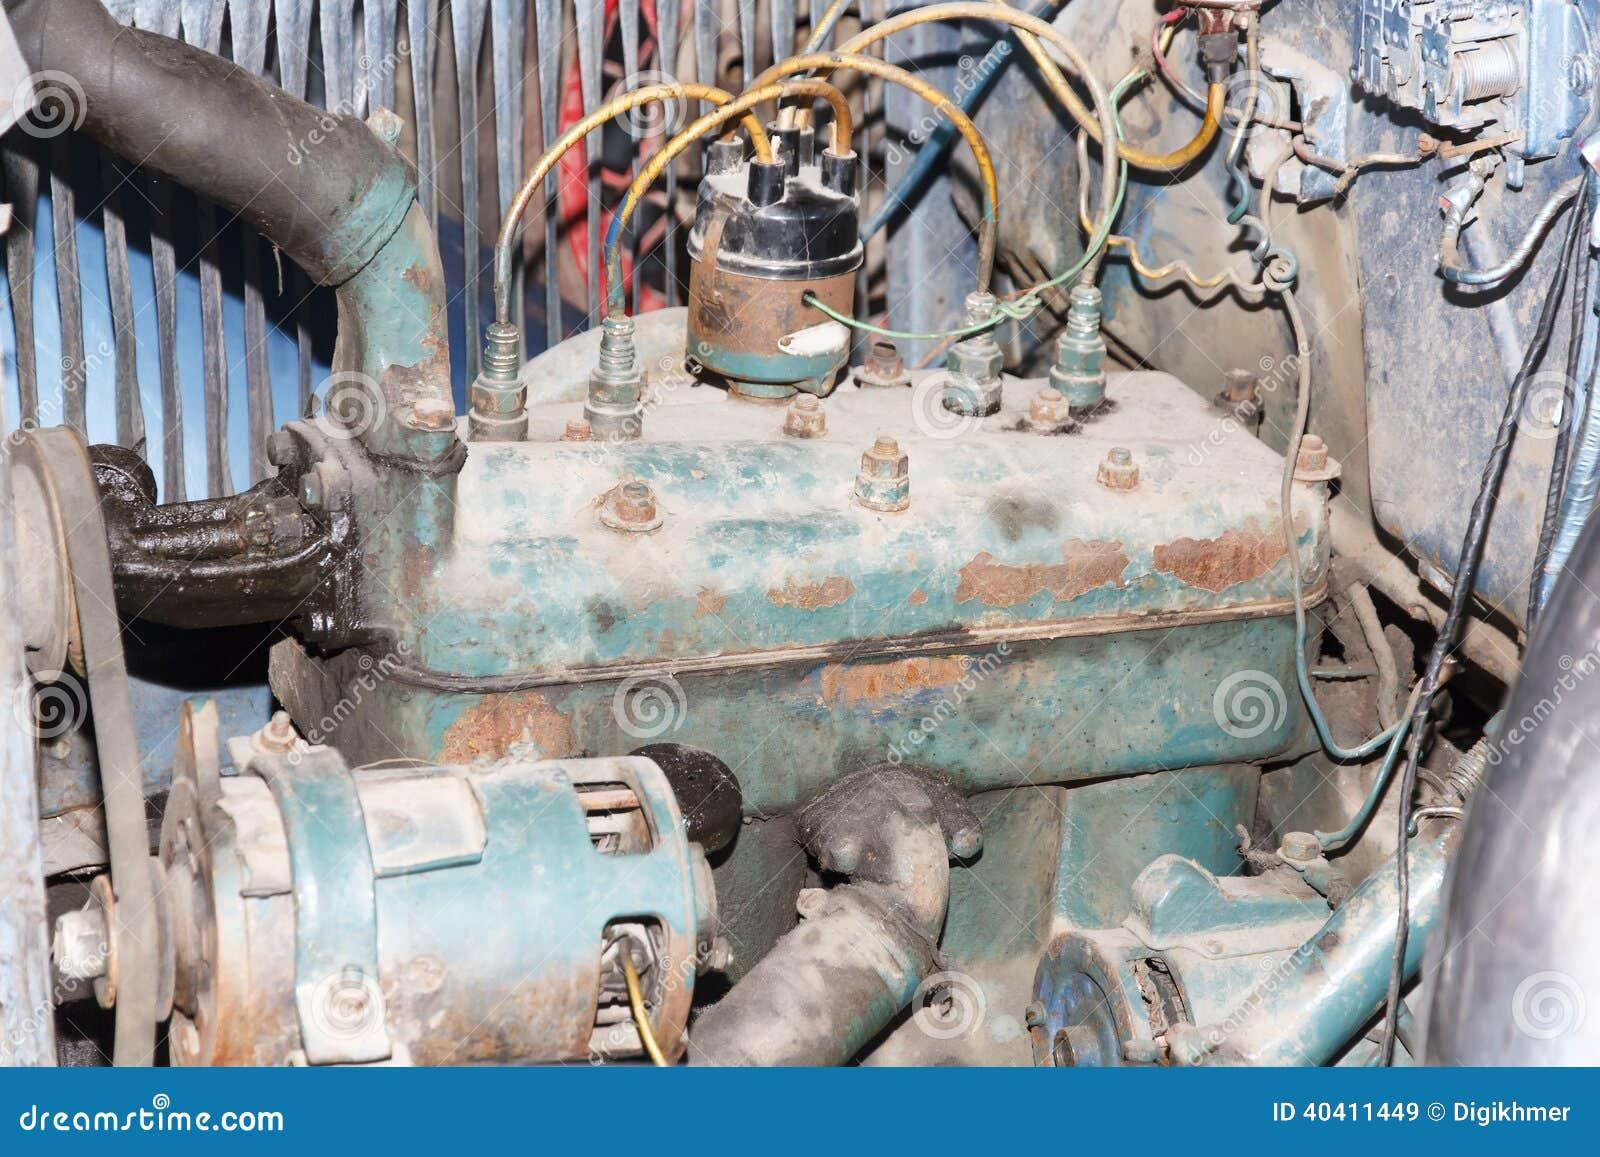 Atemberaubend Auto Motor Komponenten Fotos - Elektrische Schaltplan ...